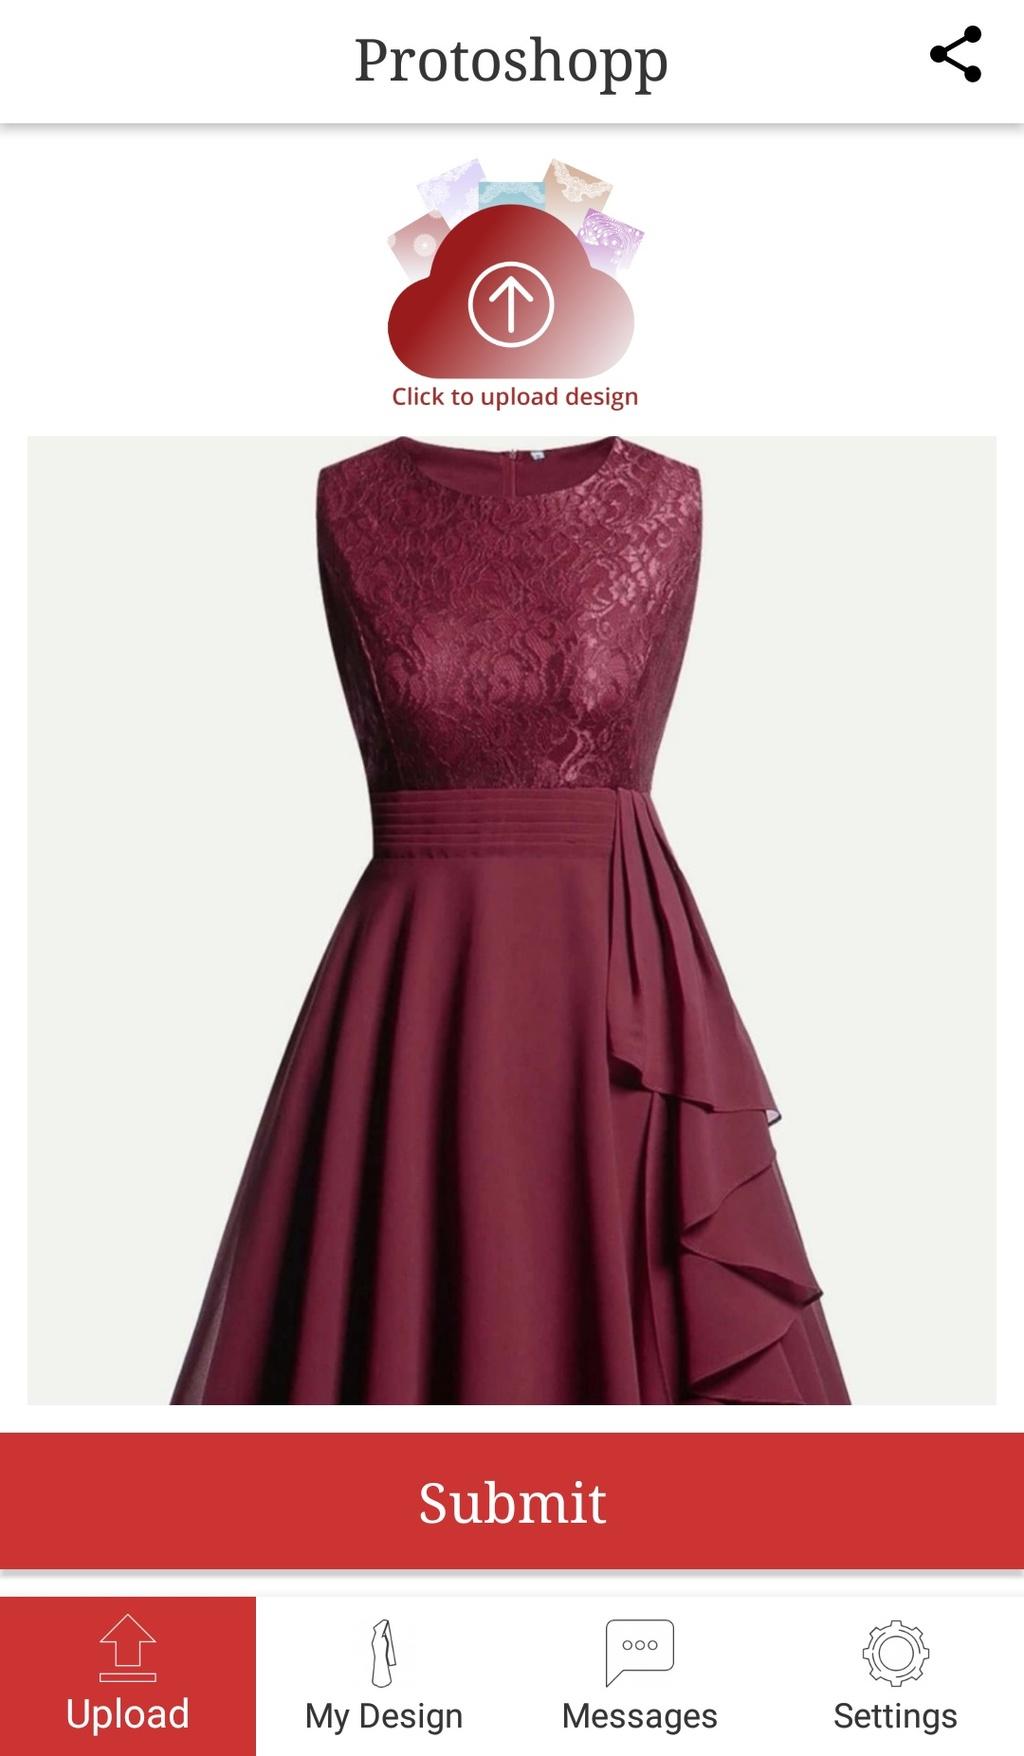 Protoshopp | Best Shopping App For Women's Clothes In India via Protoshopp